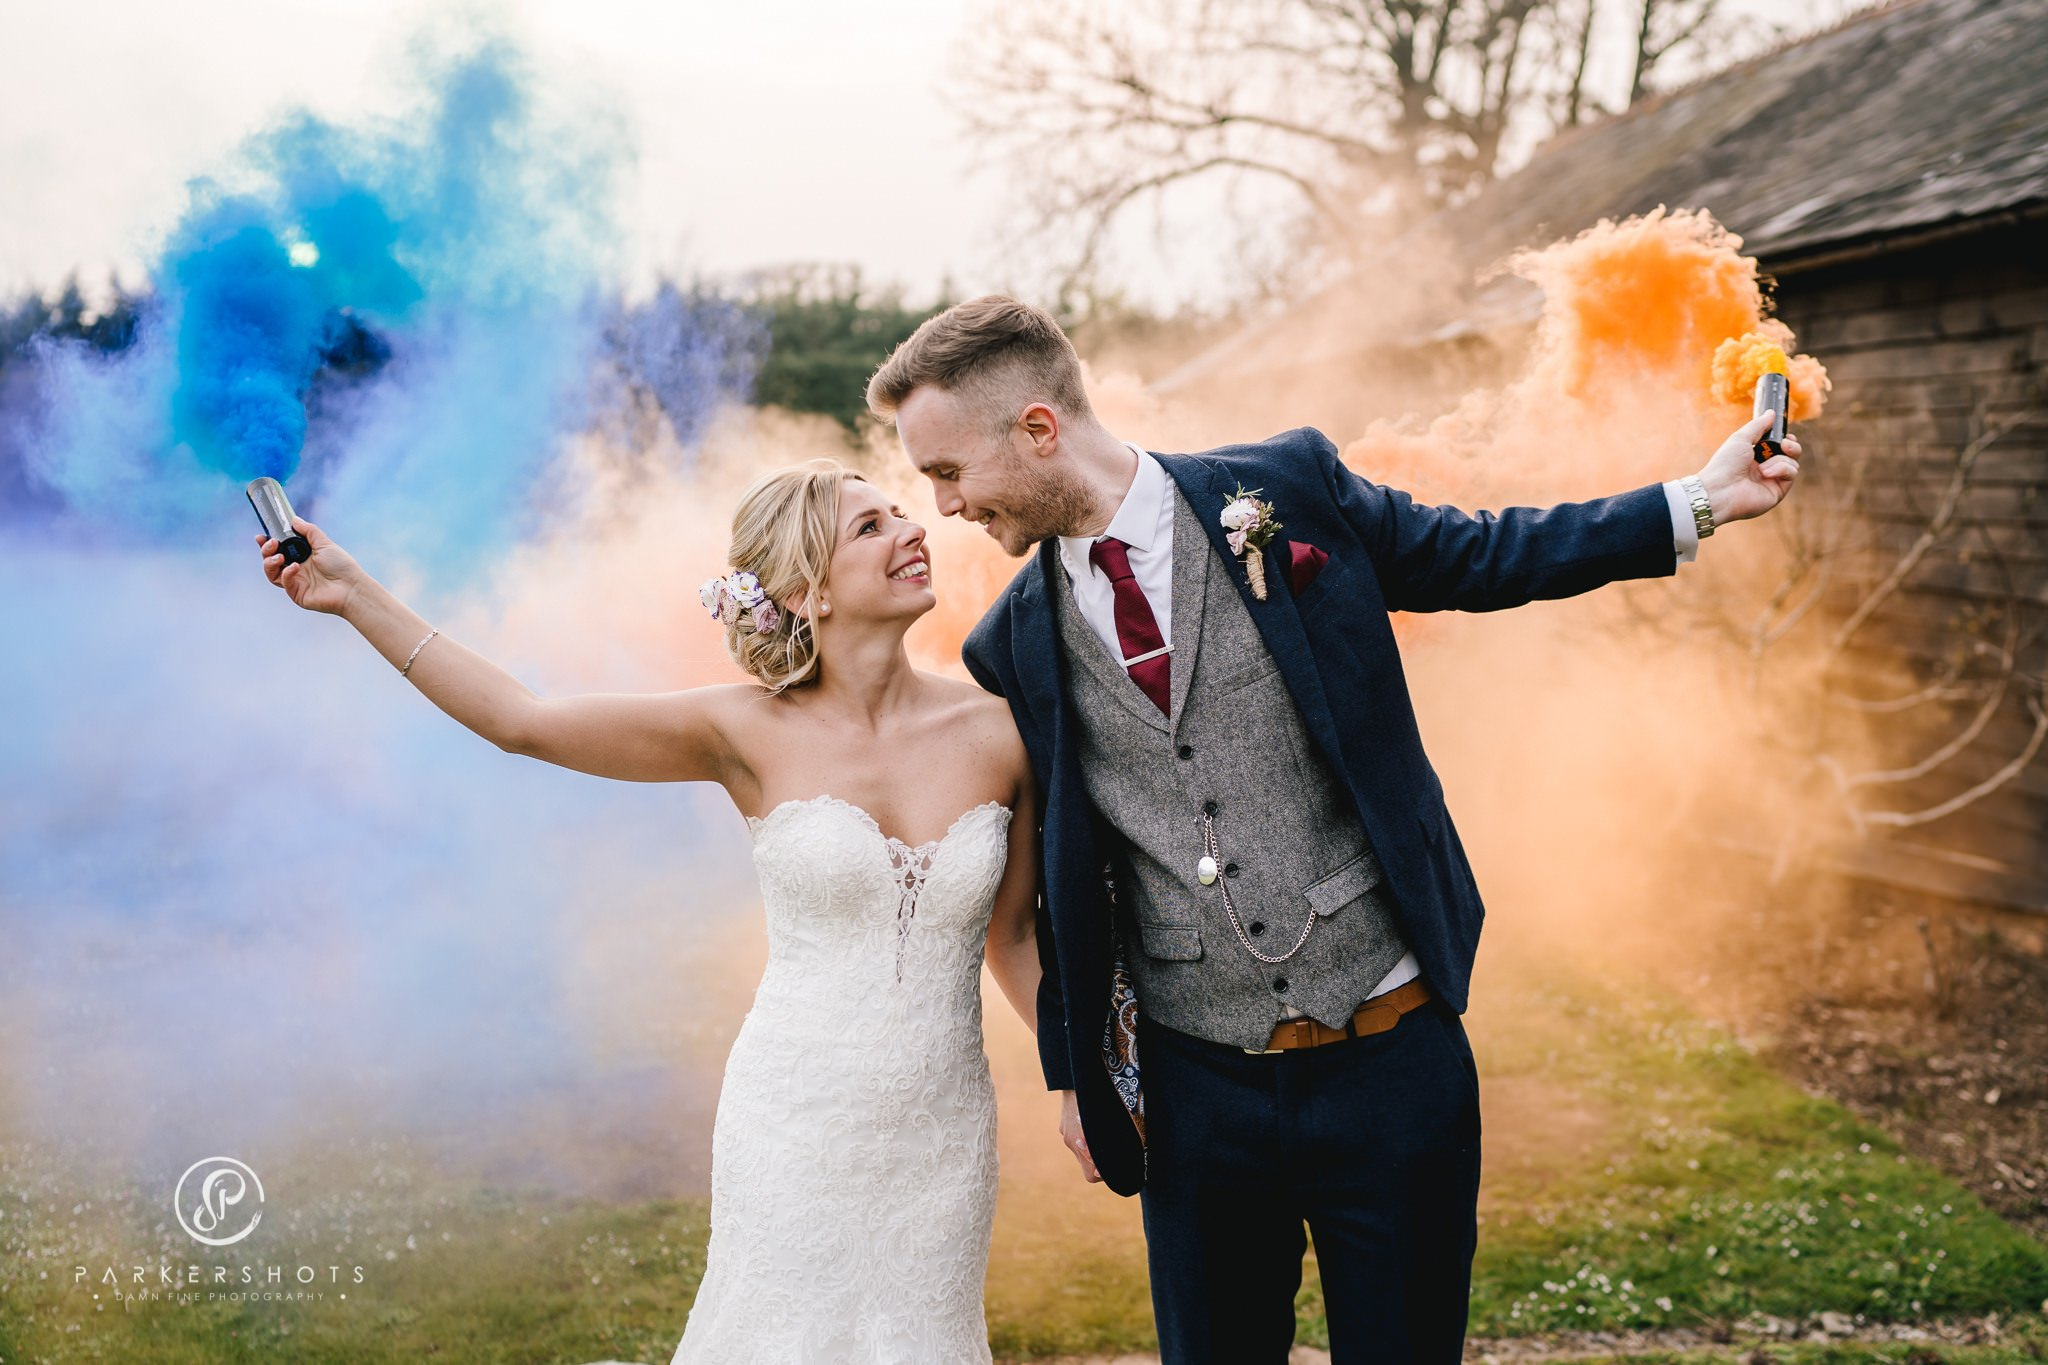 Winters Barns wedding photographer